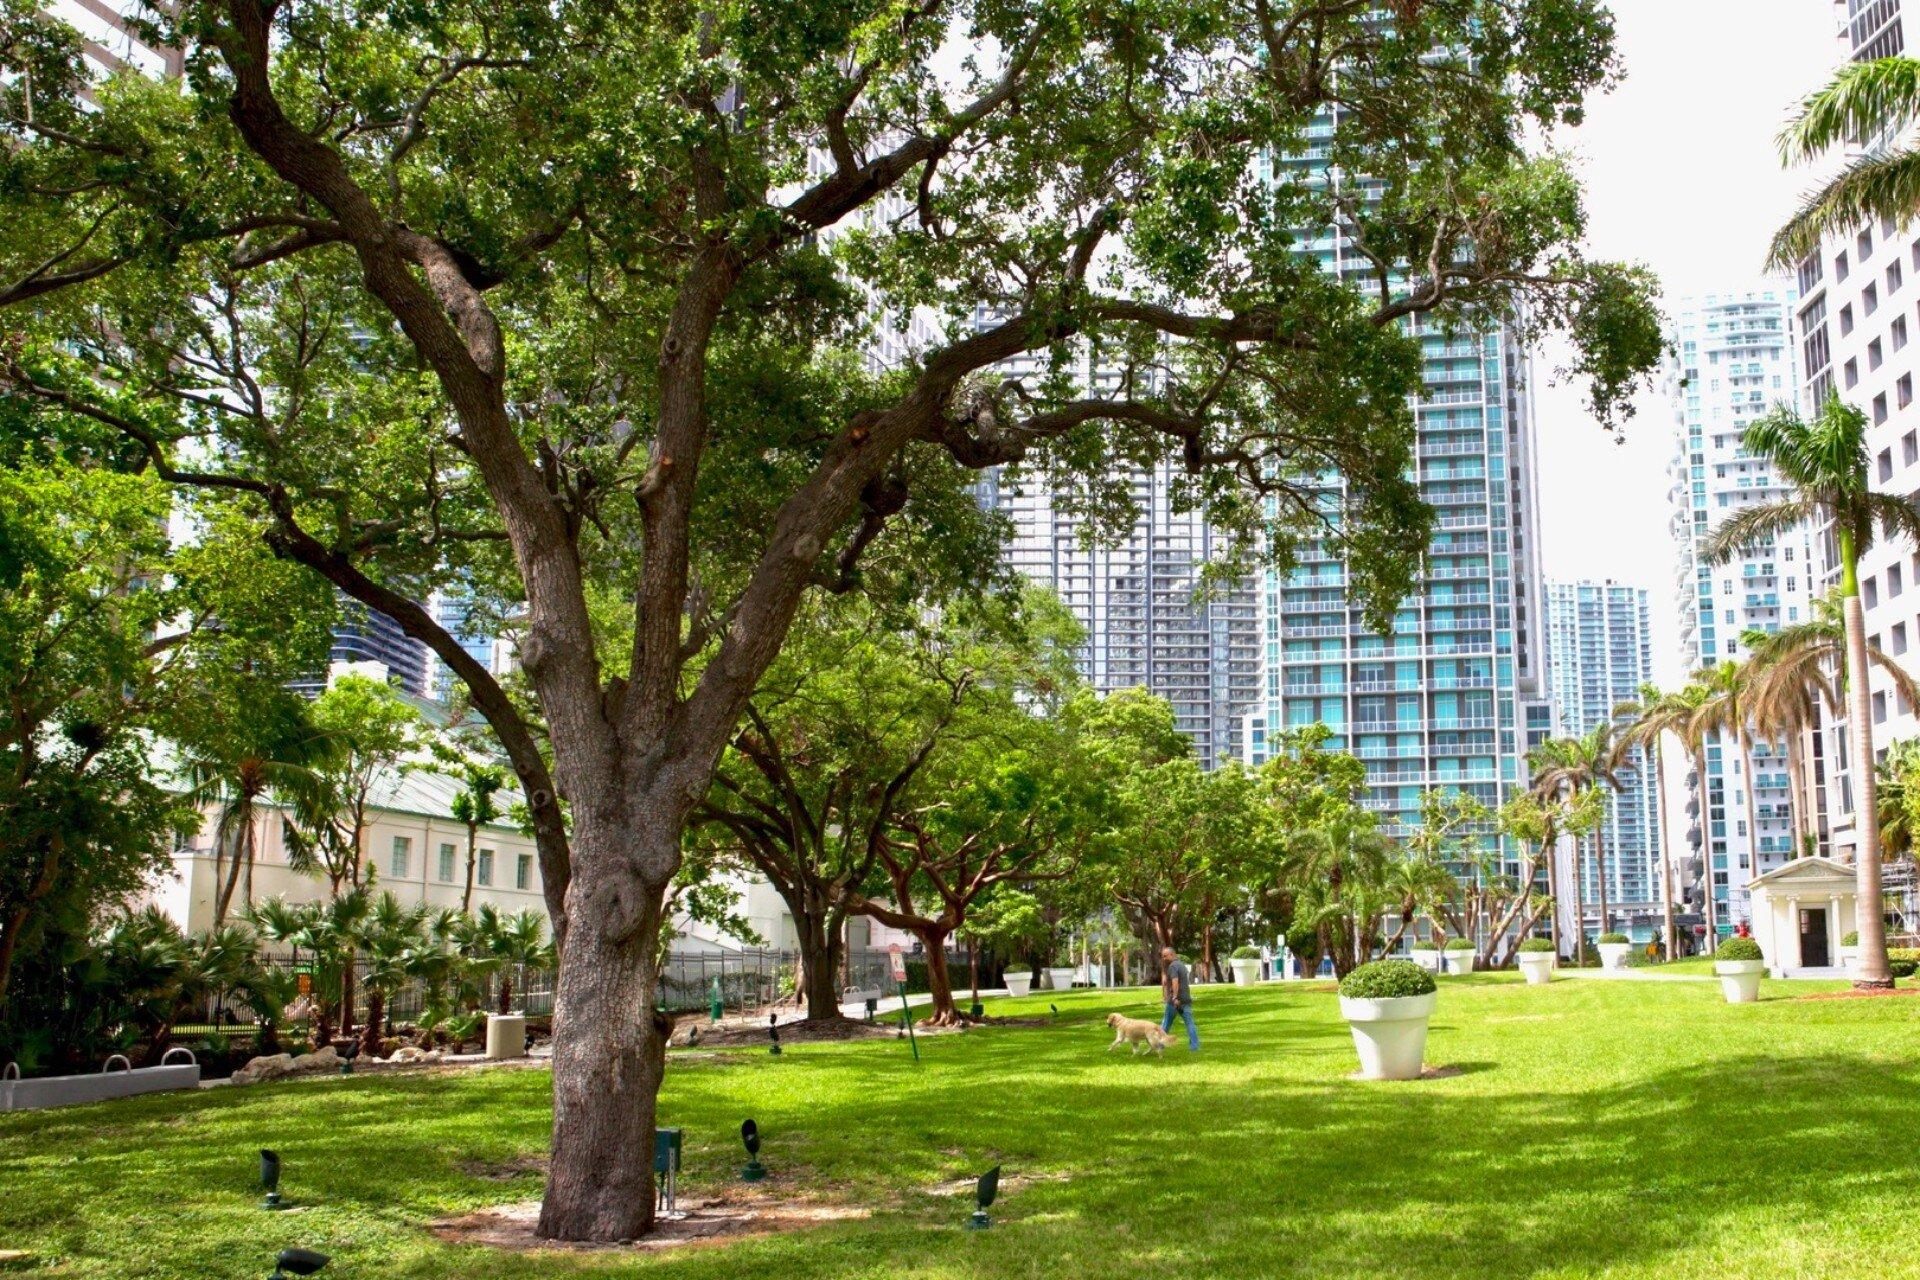 pet-area-brickell-park_lipstickandchicspaces.com.jpg